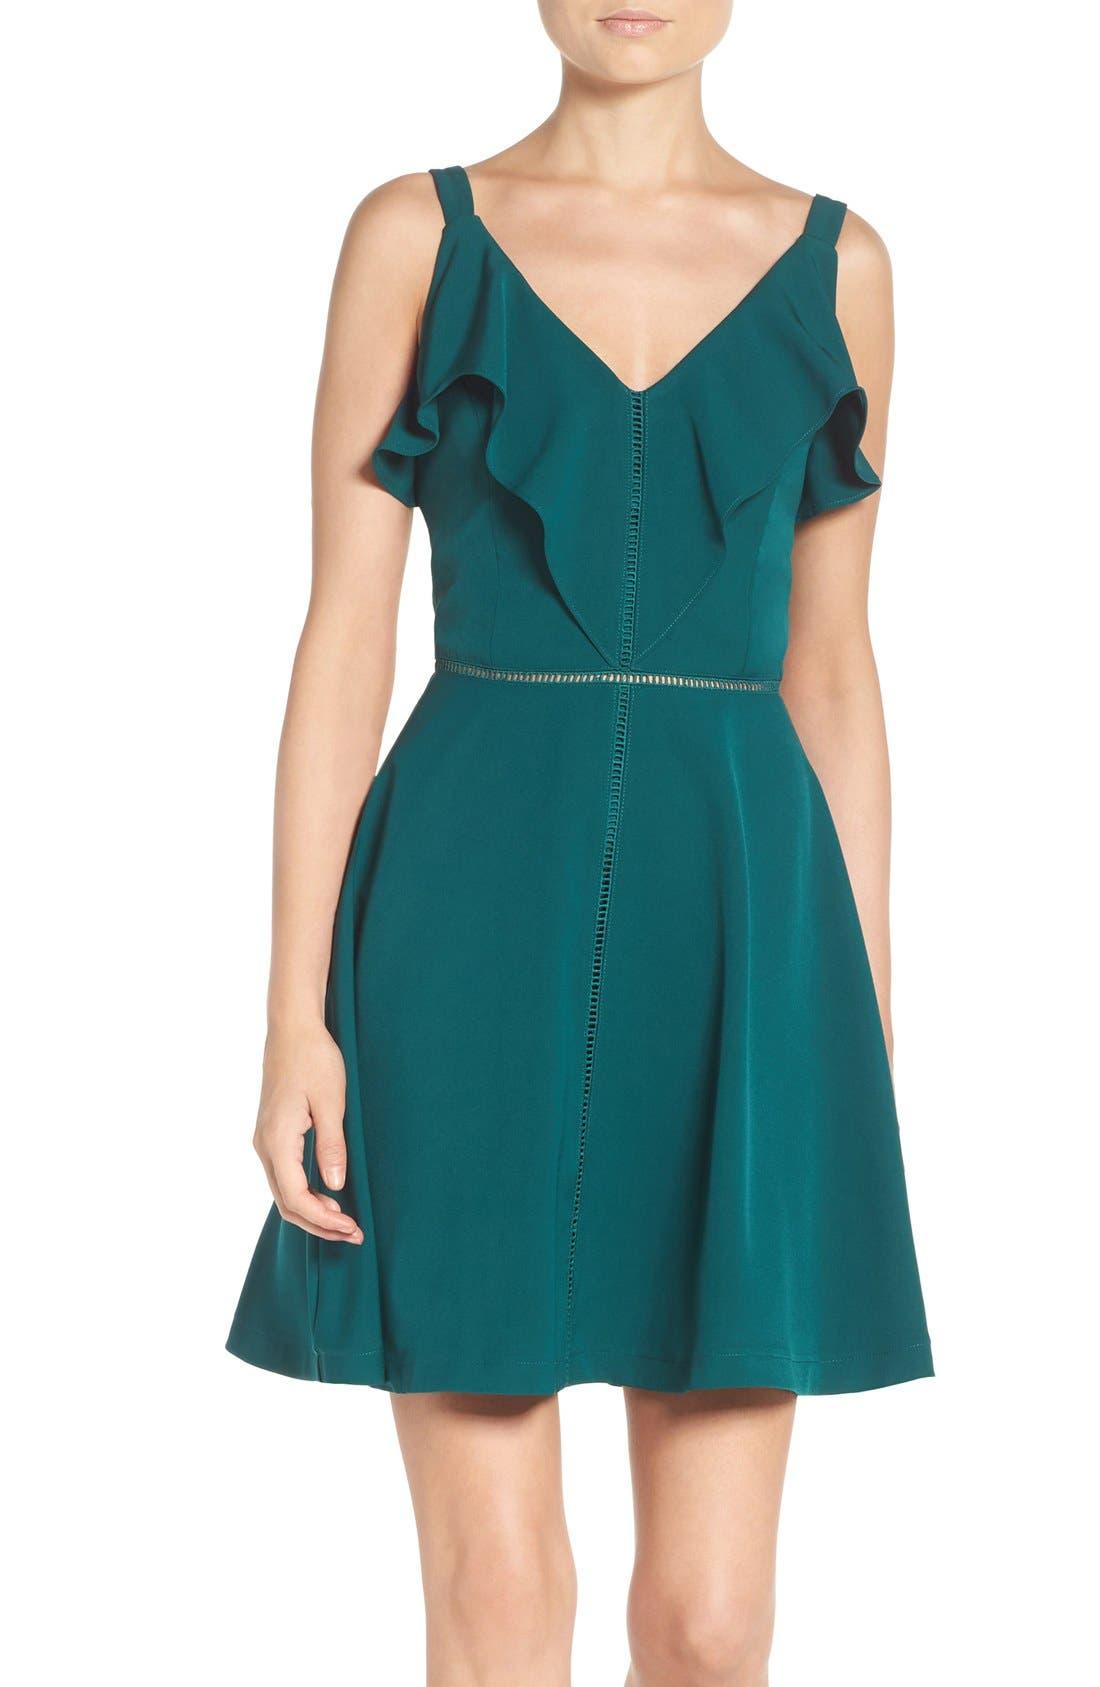 Alternate Image 1 Selected - Adelyn Rae Fit & Flare Dress